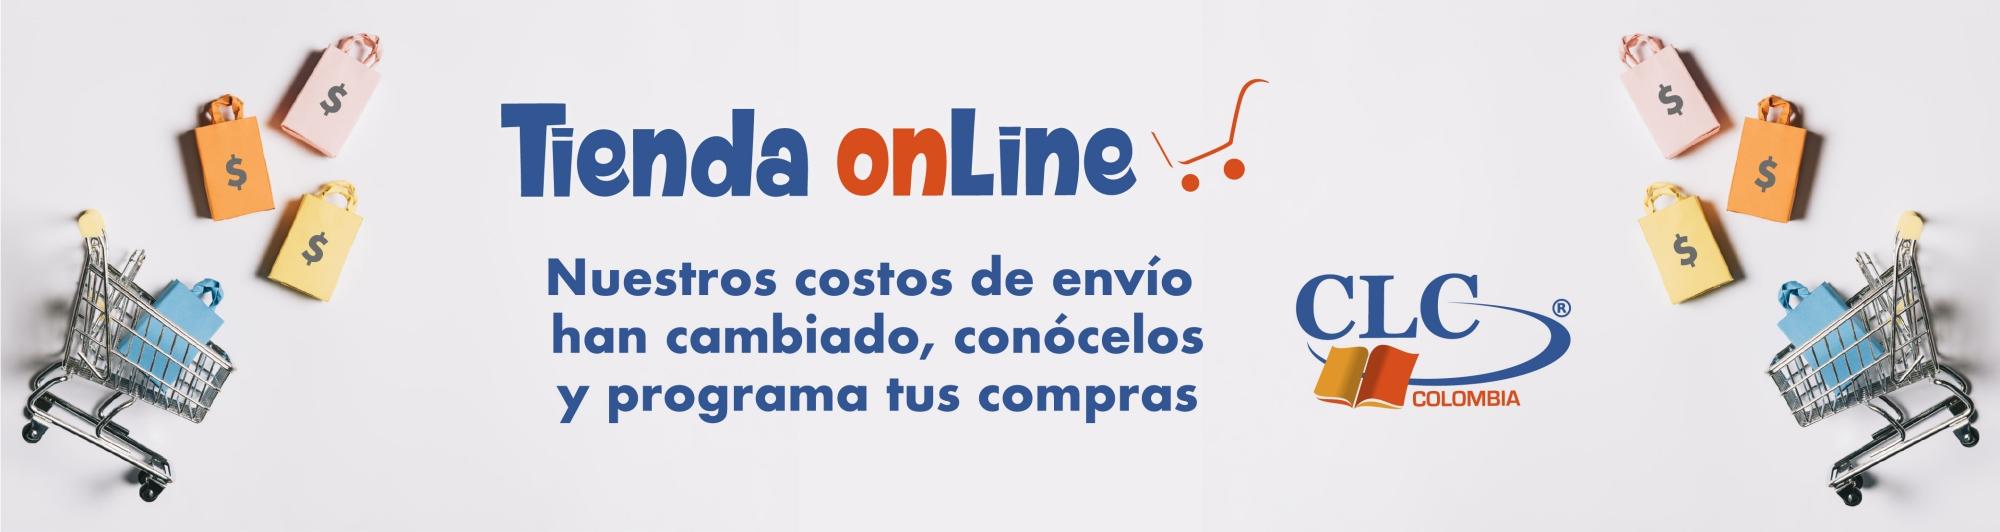 banner tienda online-02